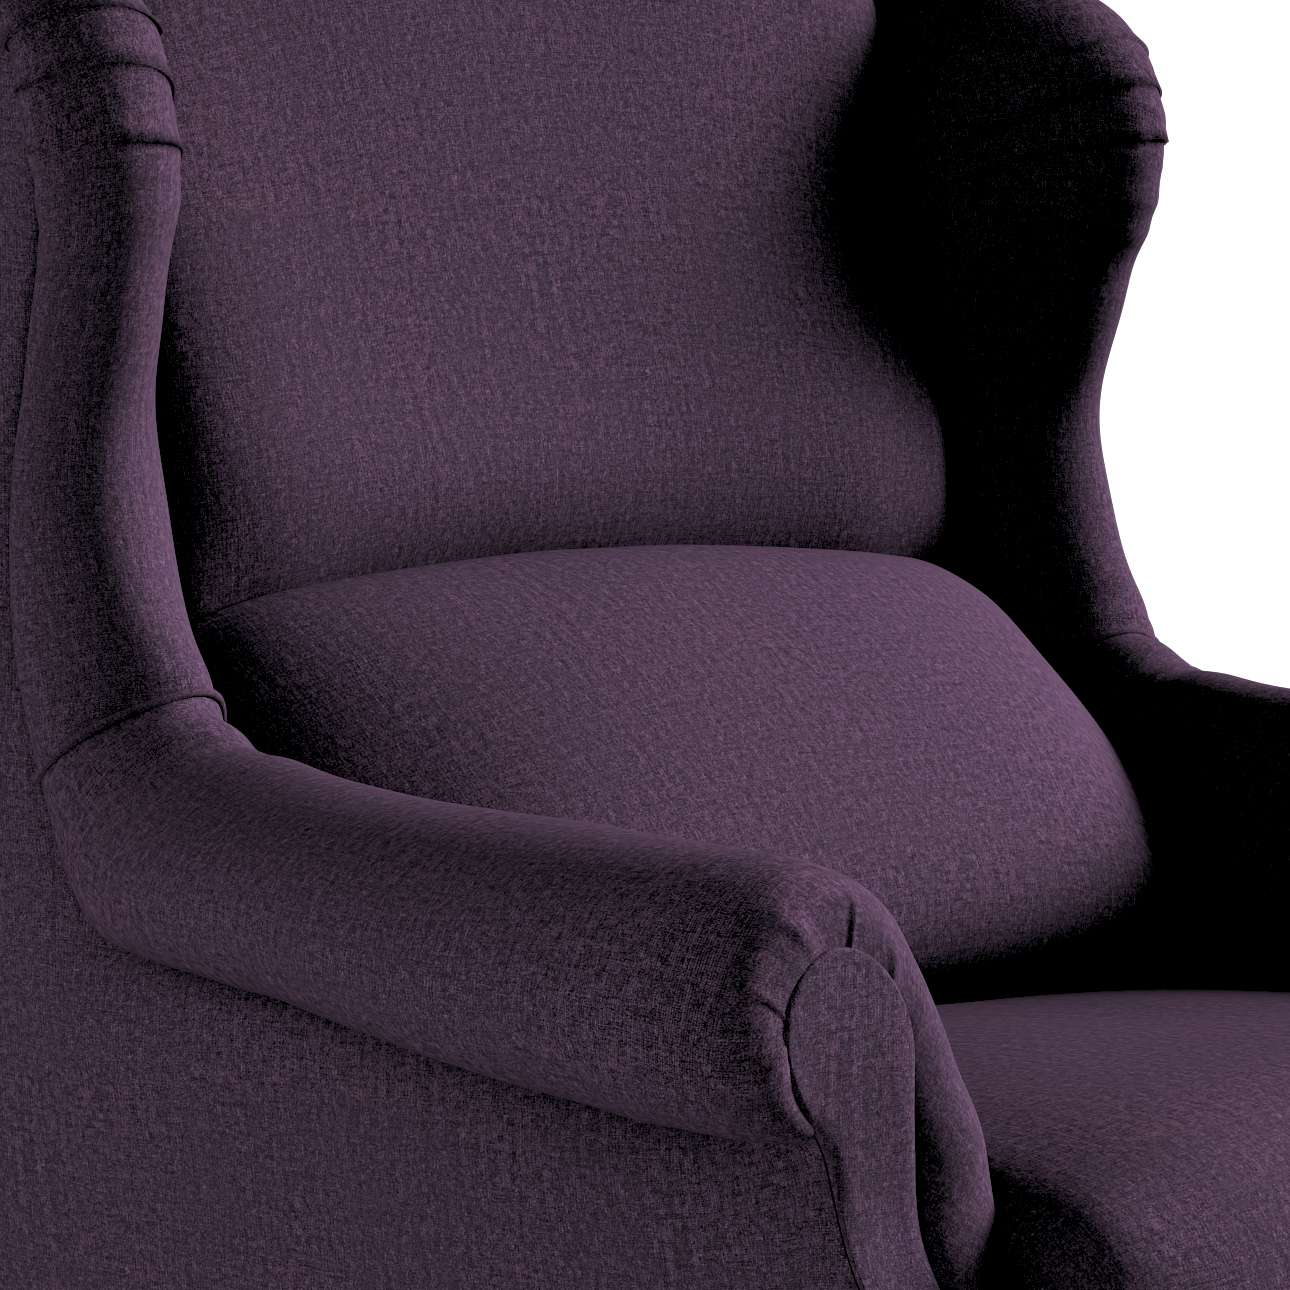 Fotel Unique w kolekcji Living, tkanina: 161-67